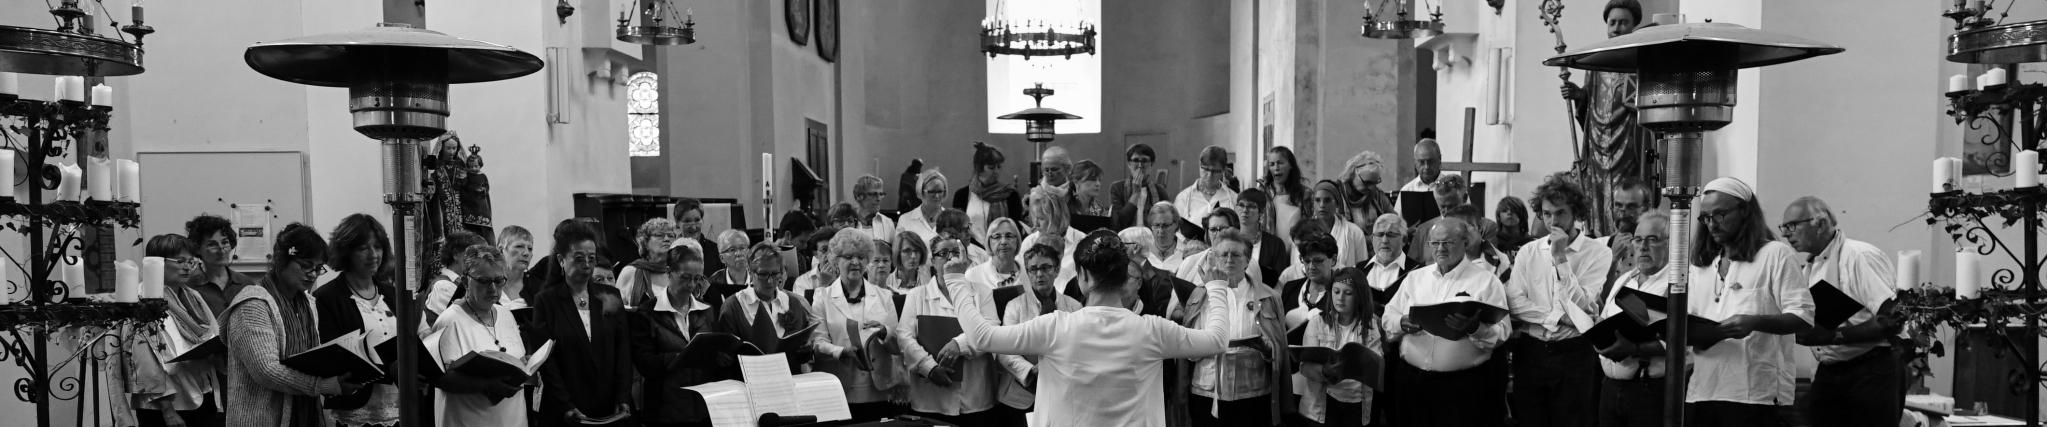 Ecole de chant Edea